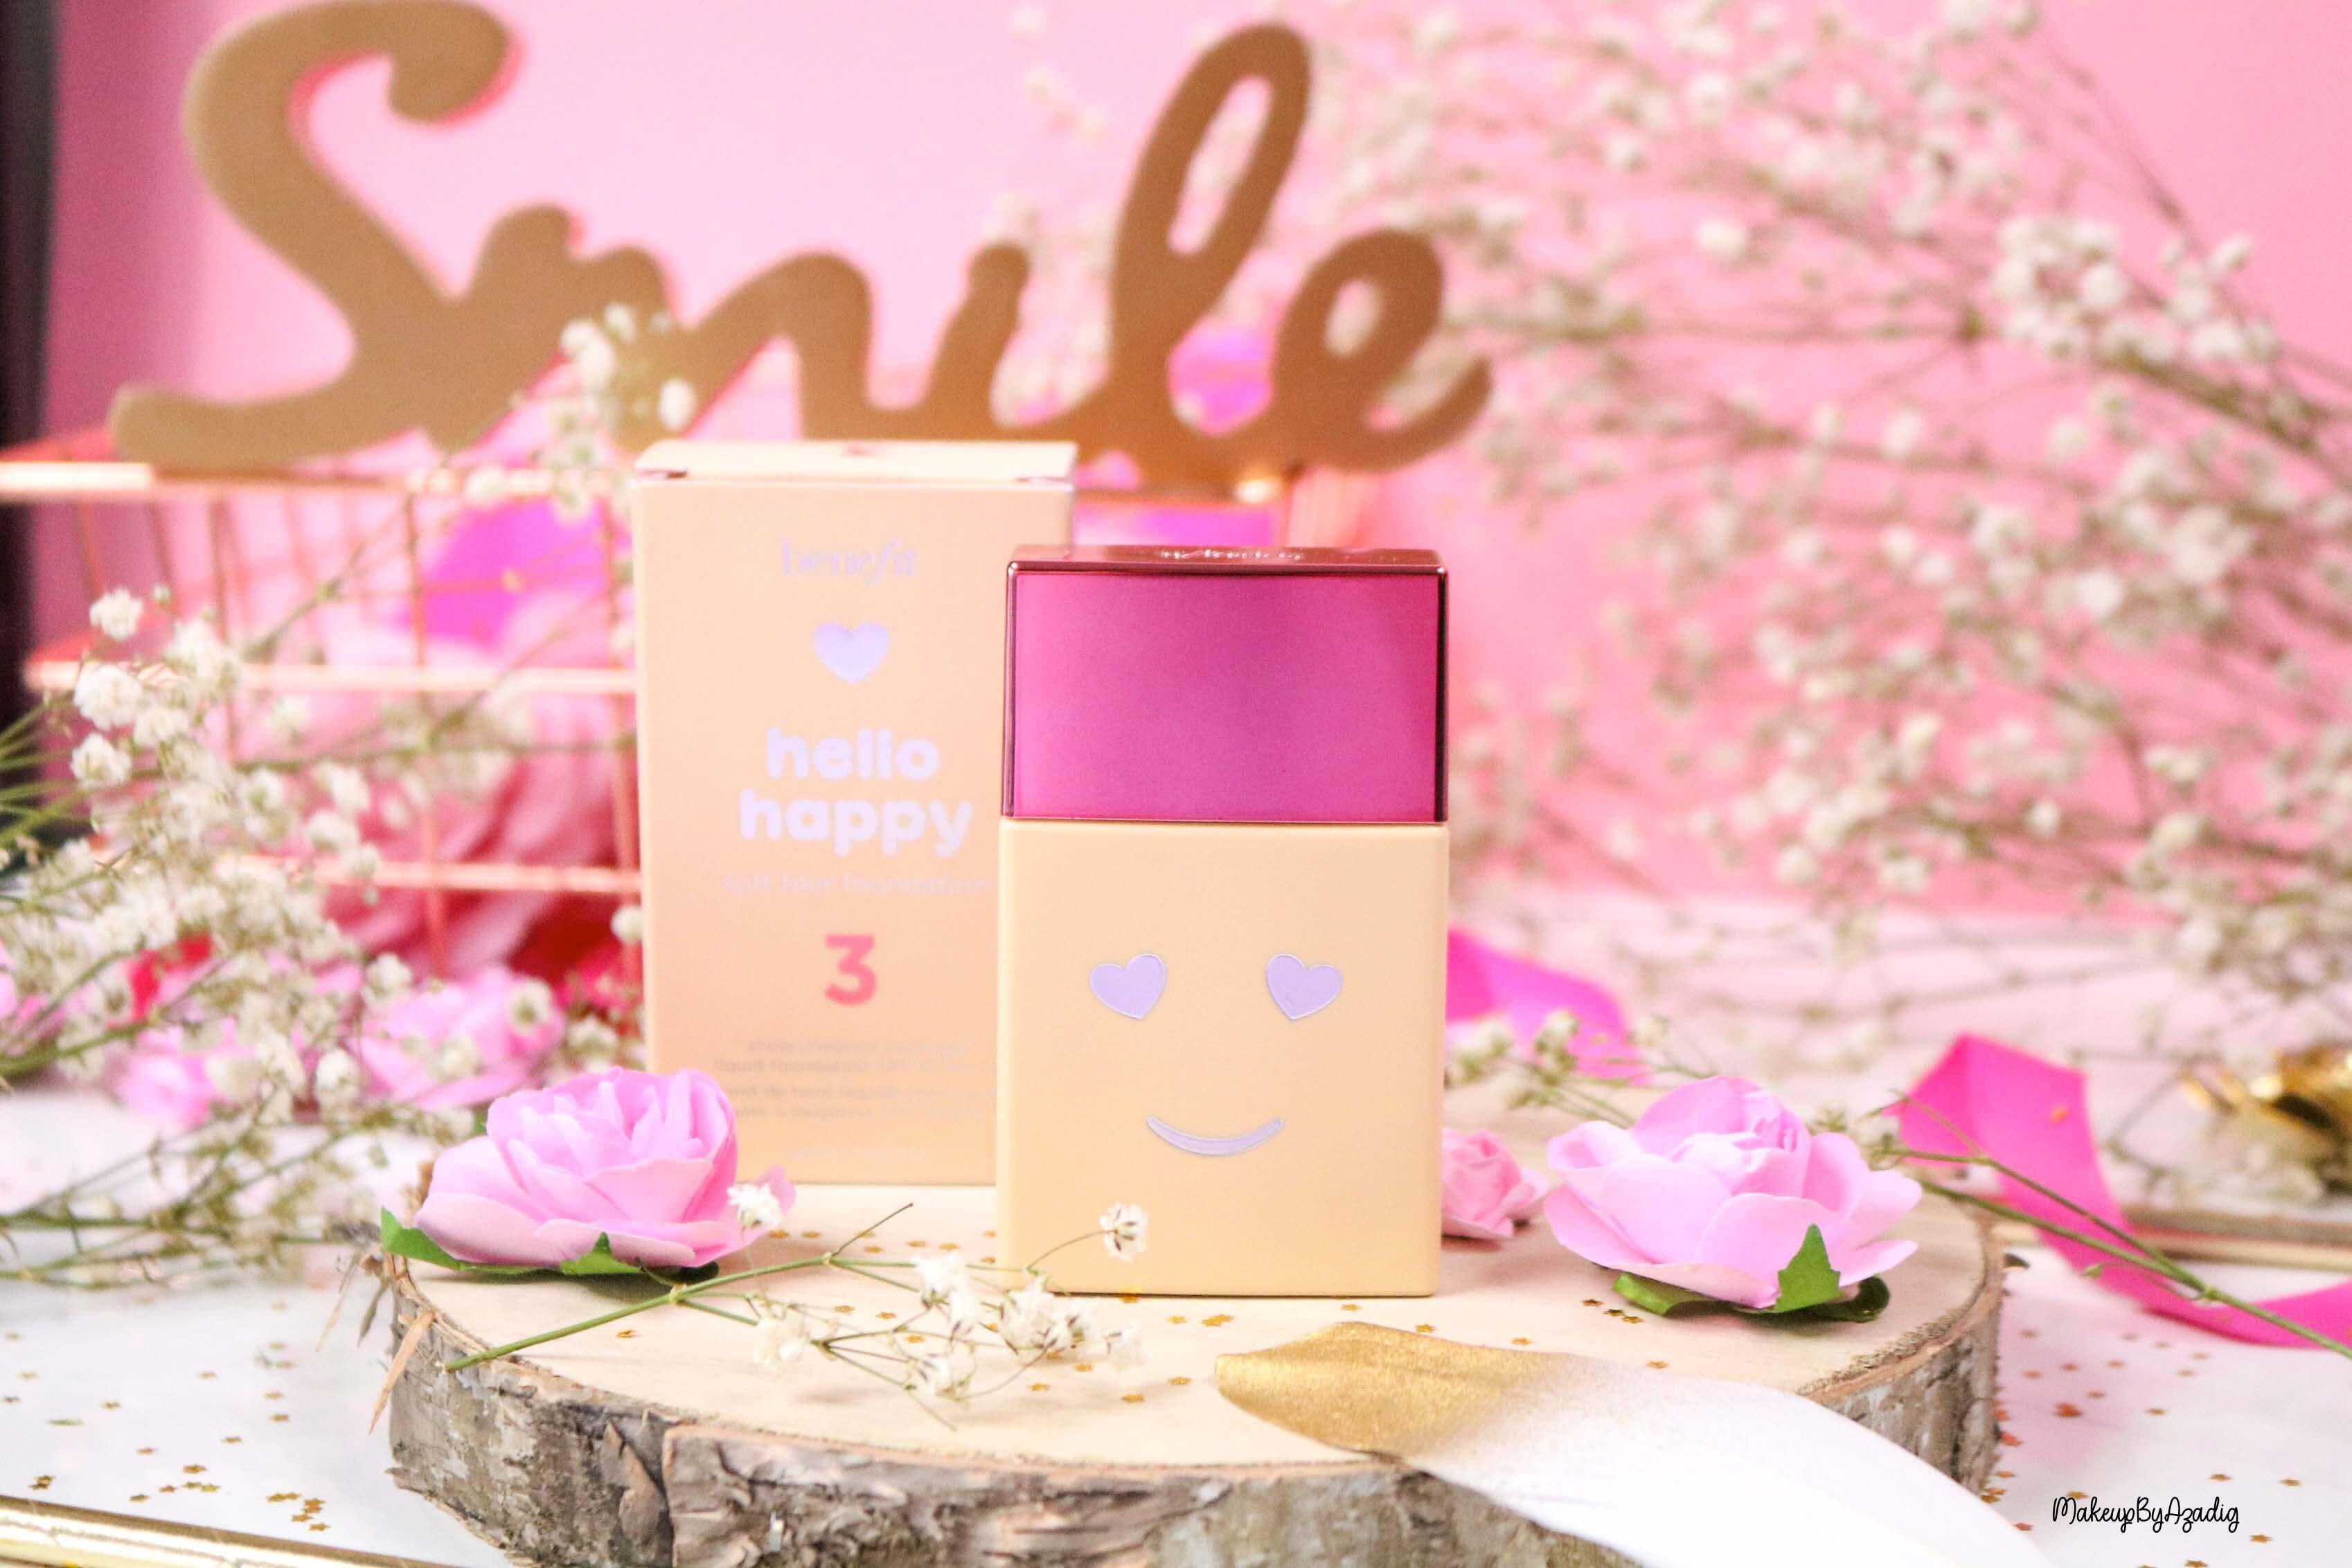 revue-nouveau-fond-de-teint-hello-happy-benefit-sephora-prix-avis-teintes-makeupbyazadig-miniature